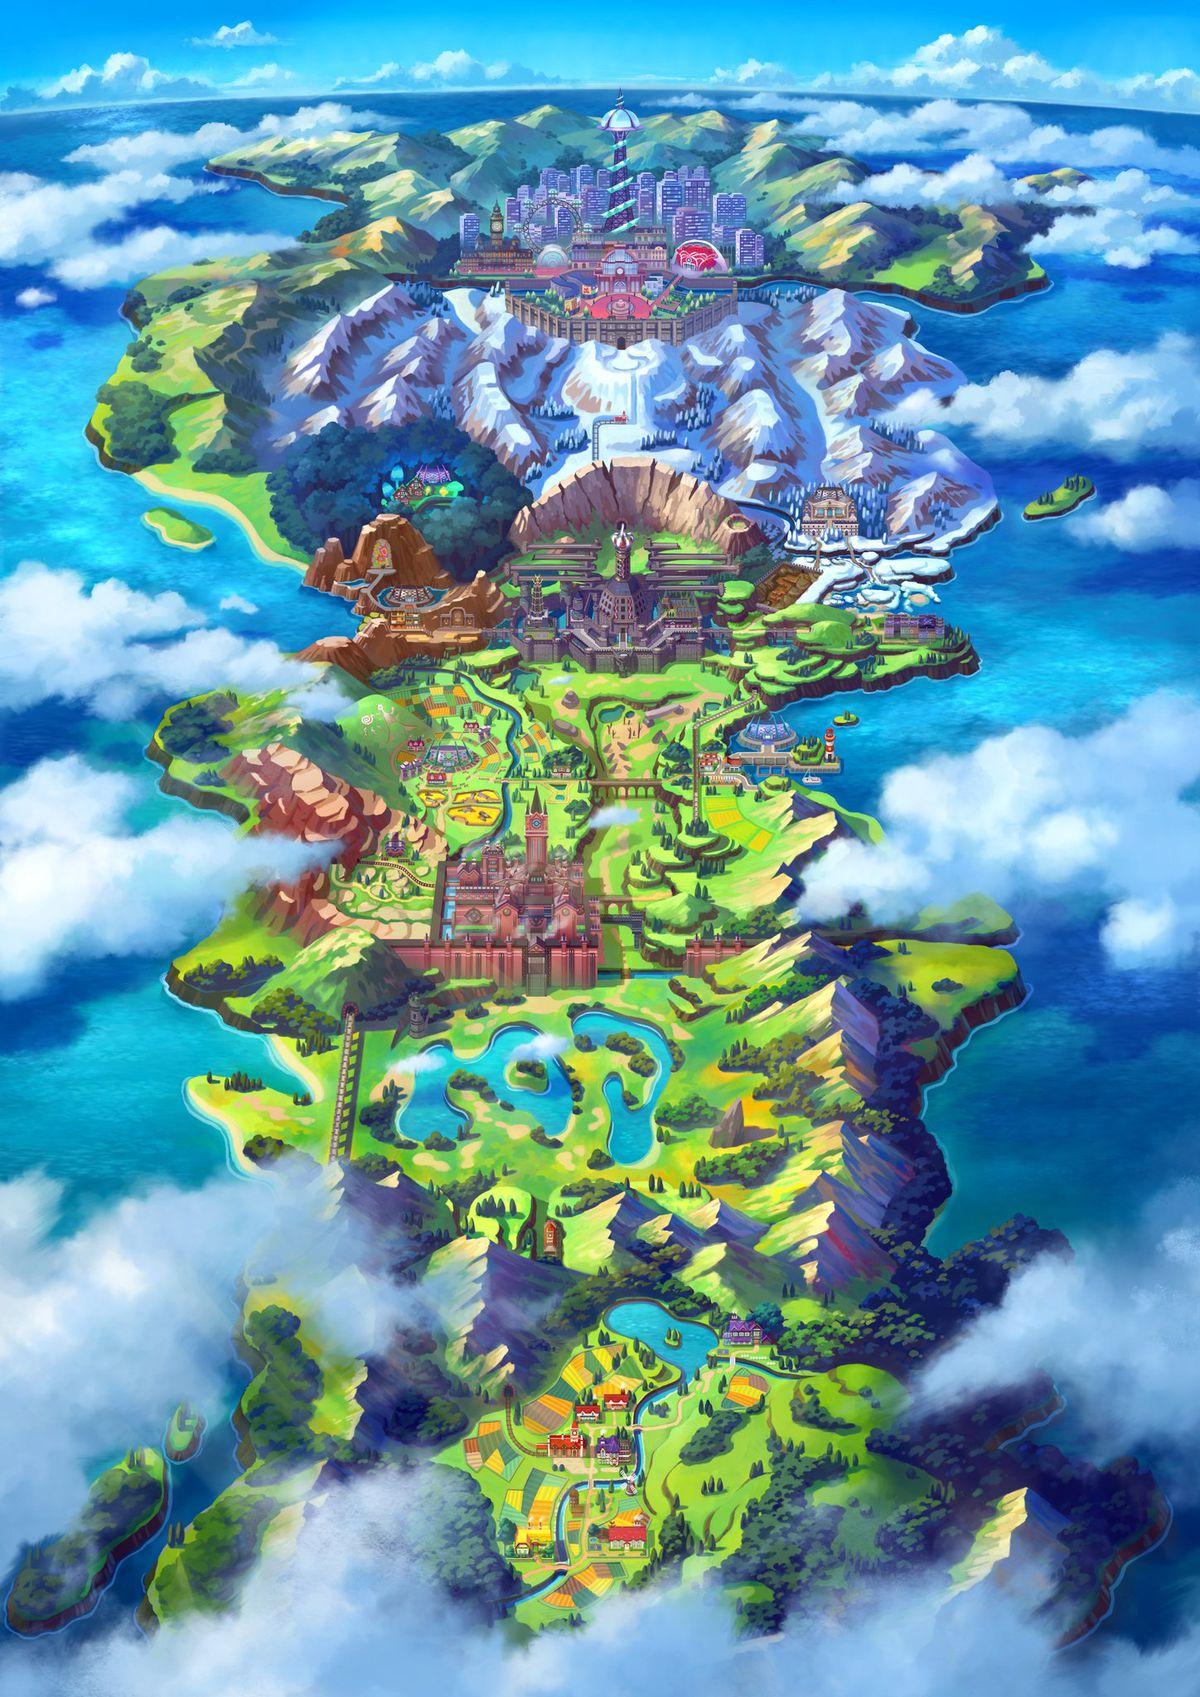 Is Pokmon Sword And Shields Galar Region Based On The UK